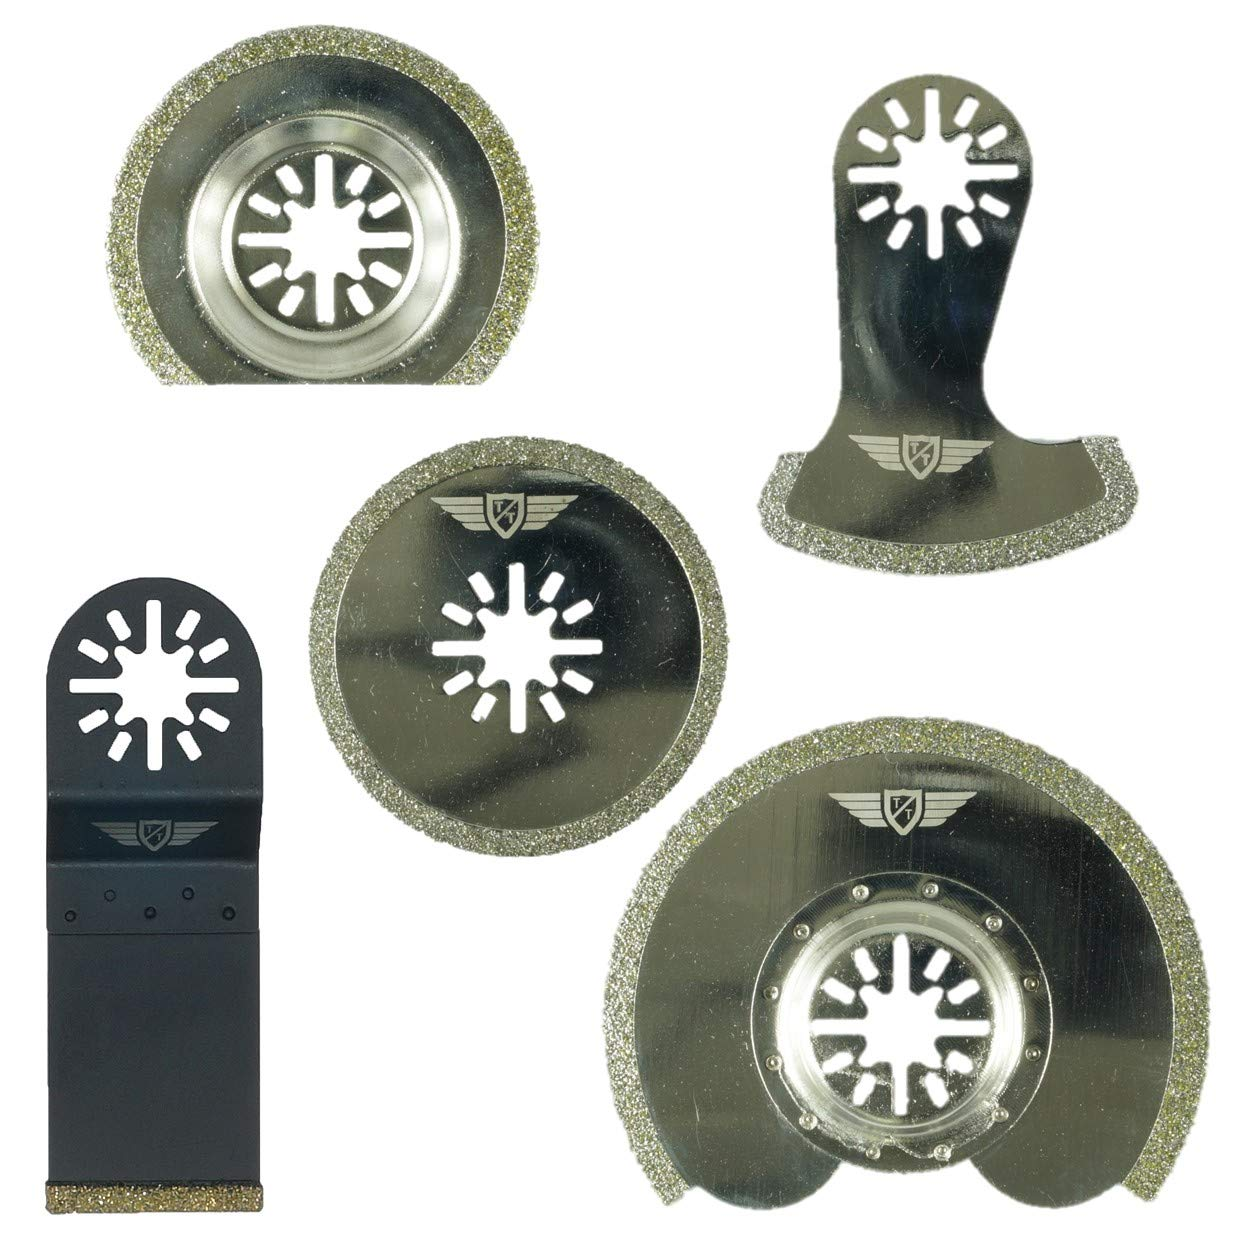 Makita Milwaukee Einhell Parkside Ryobi multiherramienta Worx WorkZone Multi herramienta accesorios No-StarLock 5 x TopsTools UNKD5 diamante lechada cuchillas para Bosch Fein